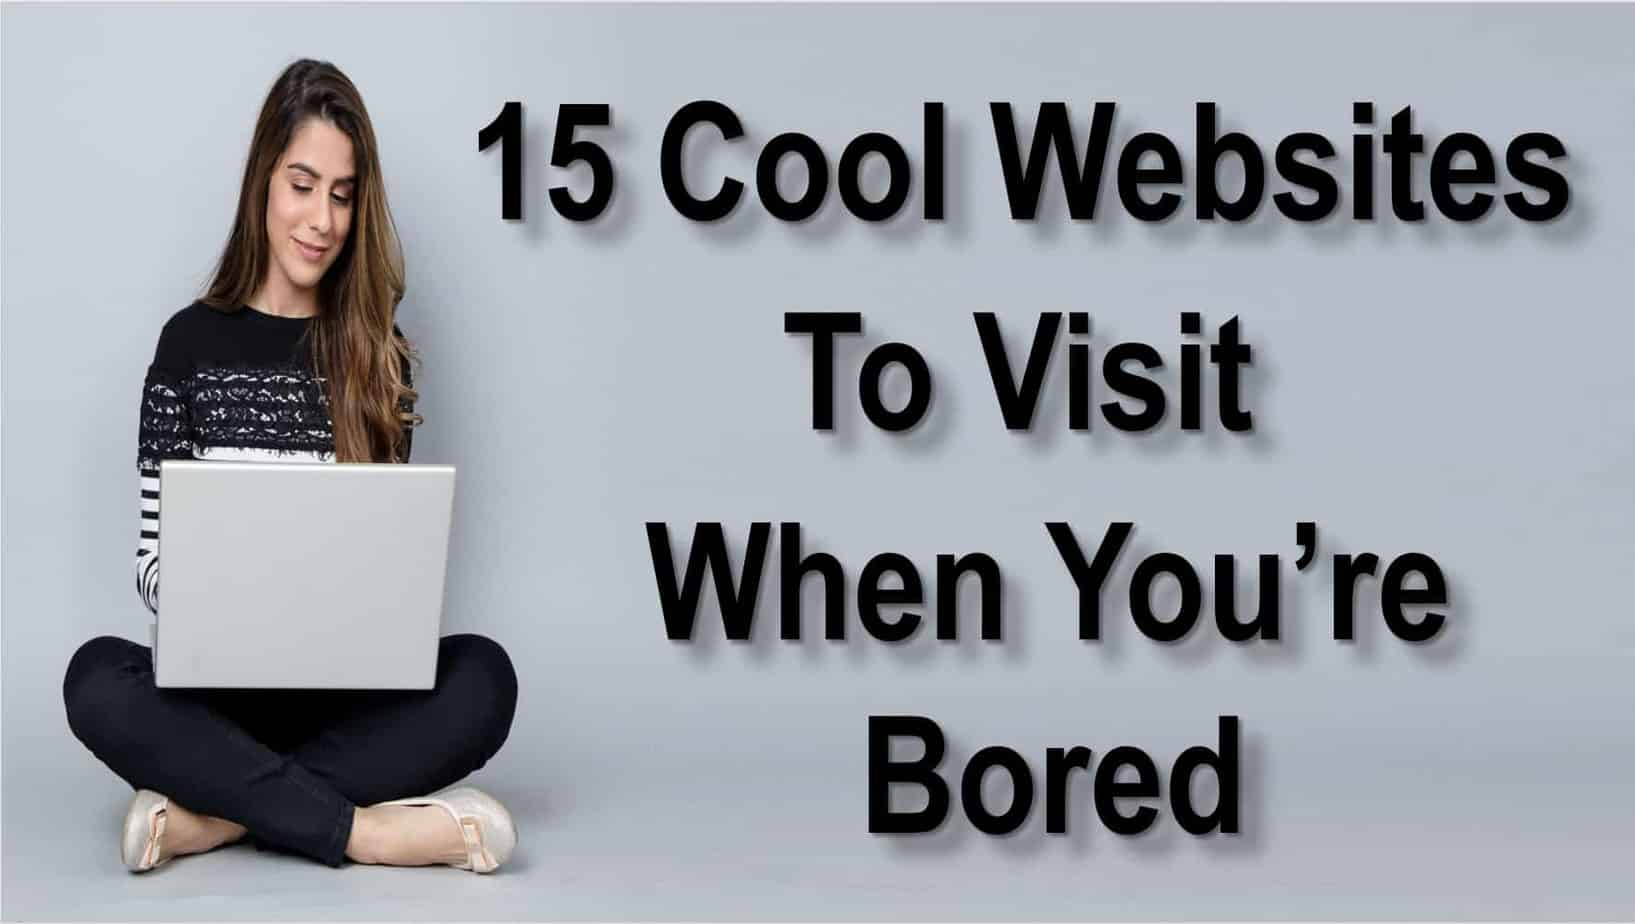 15 cool websites